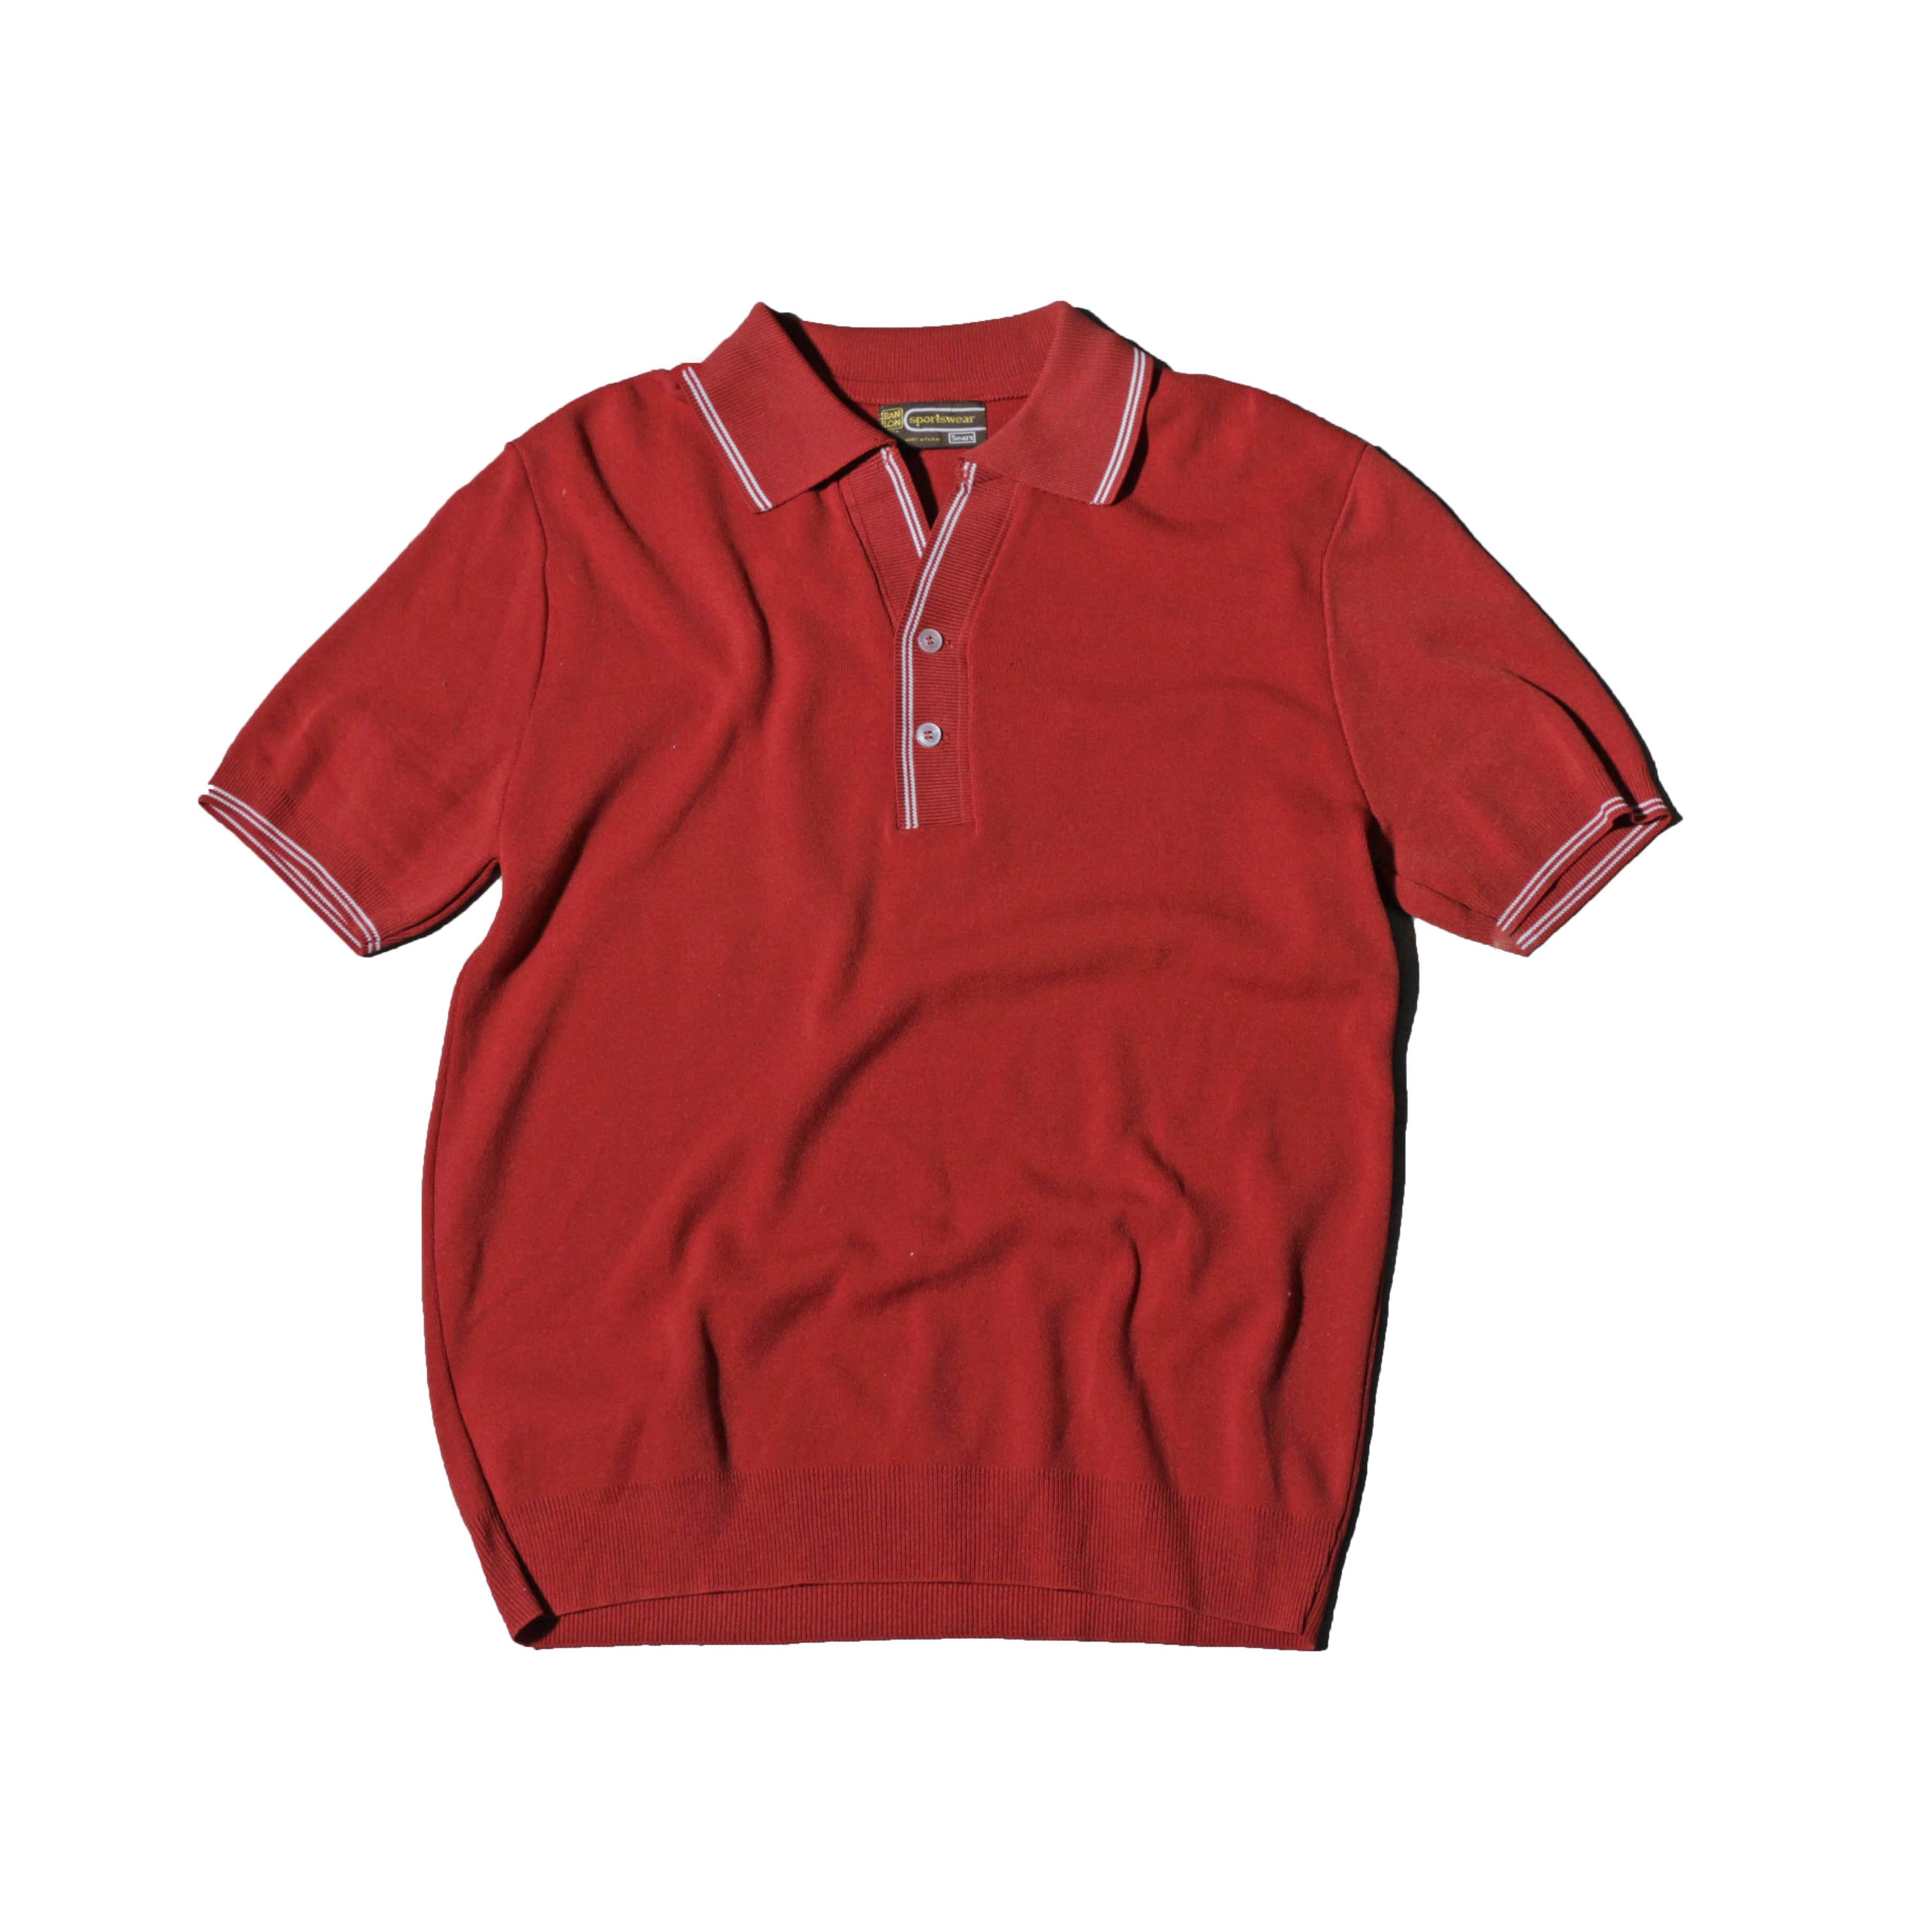 Sears 70s KnitPoloShirts